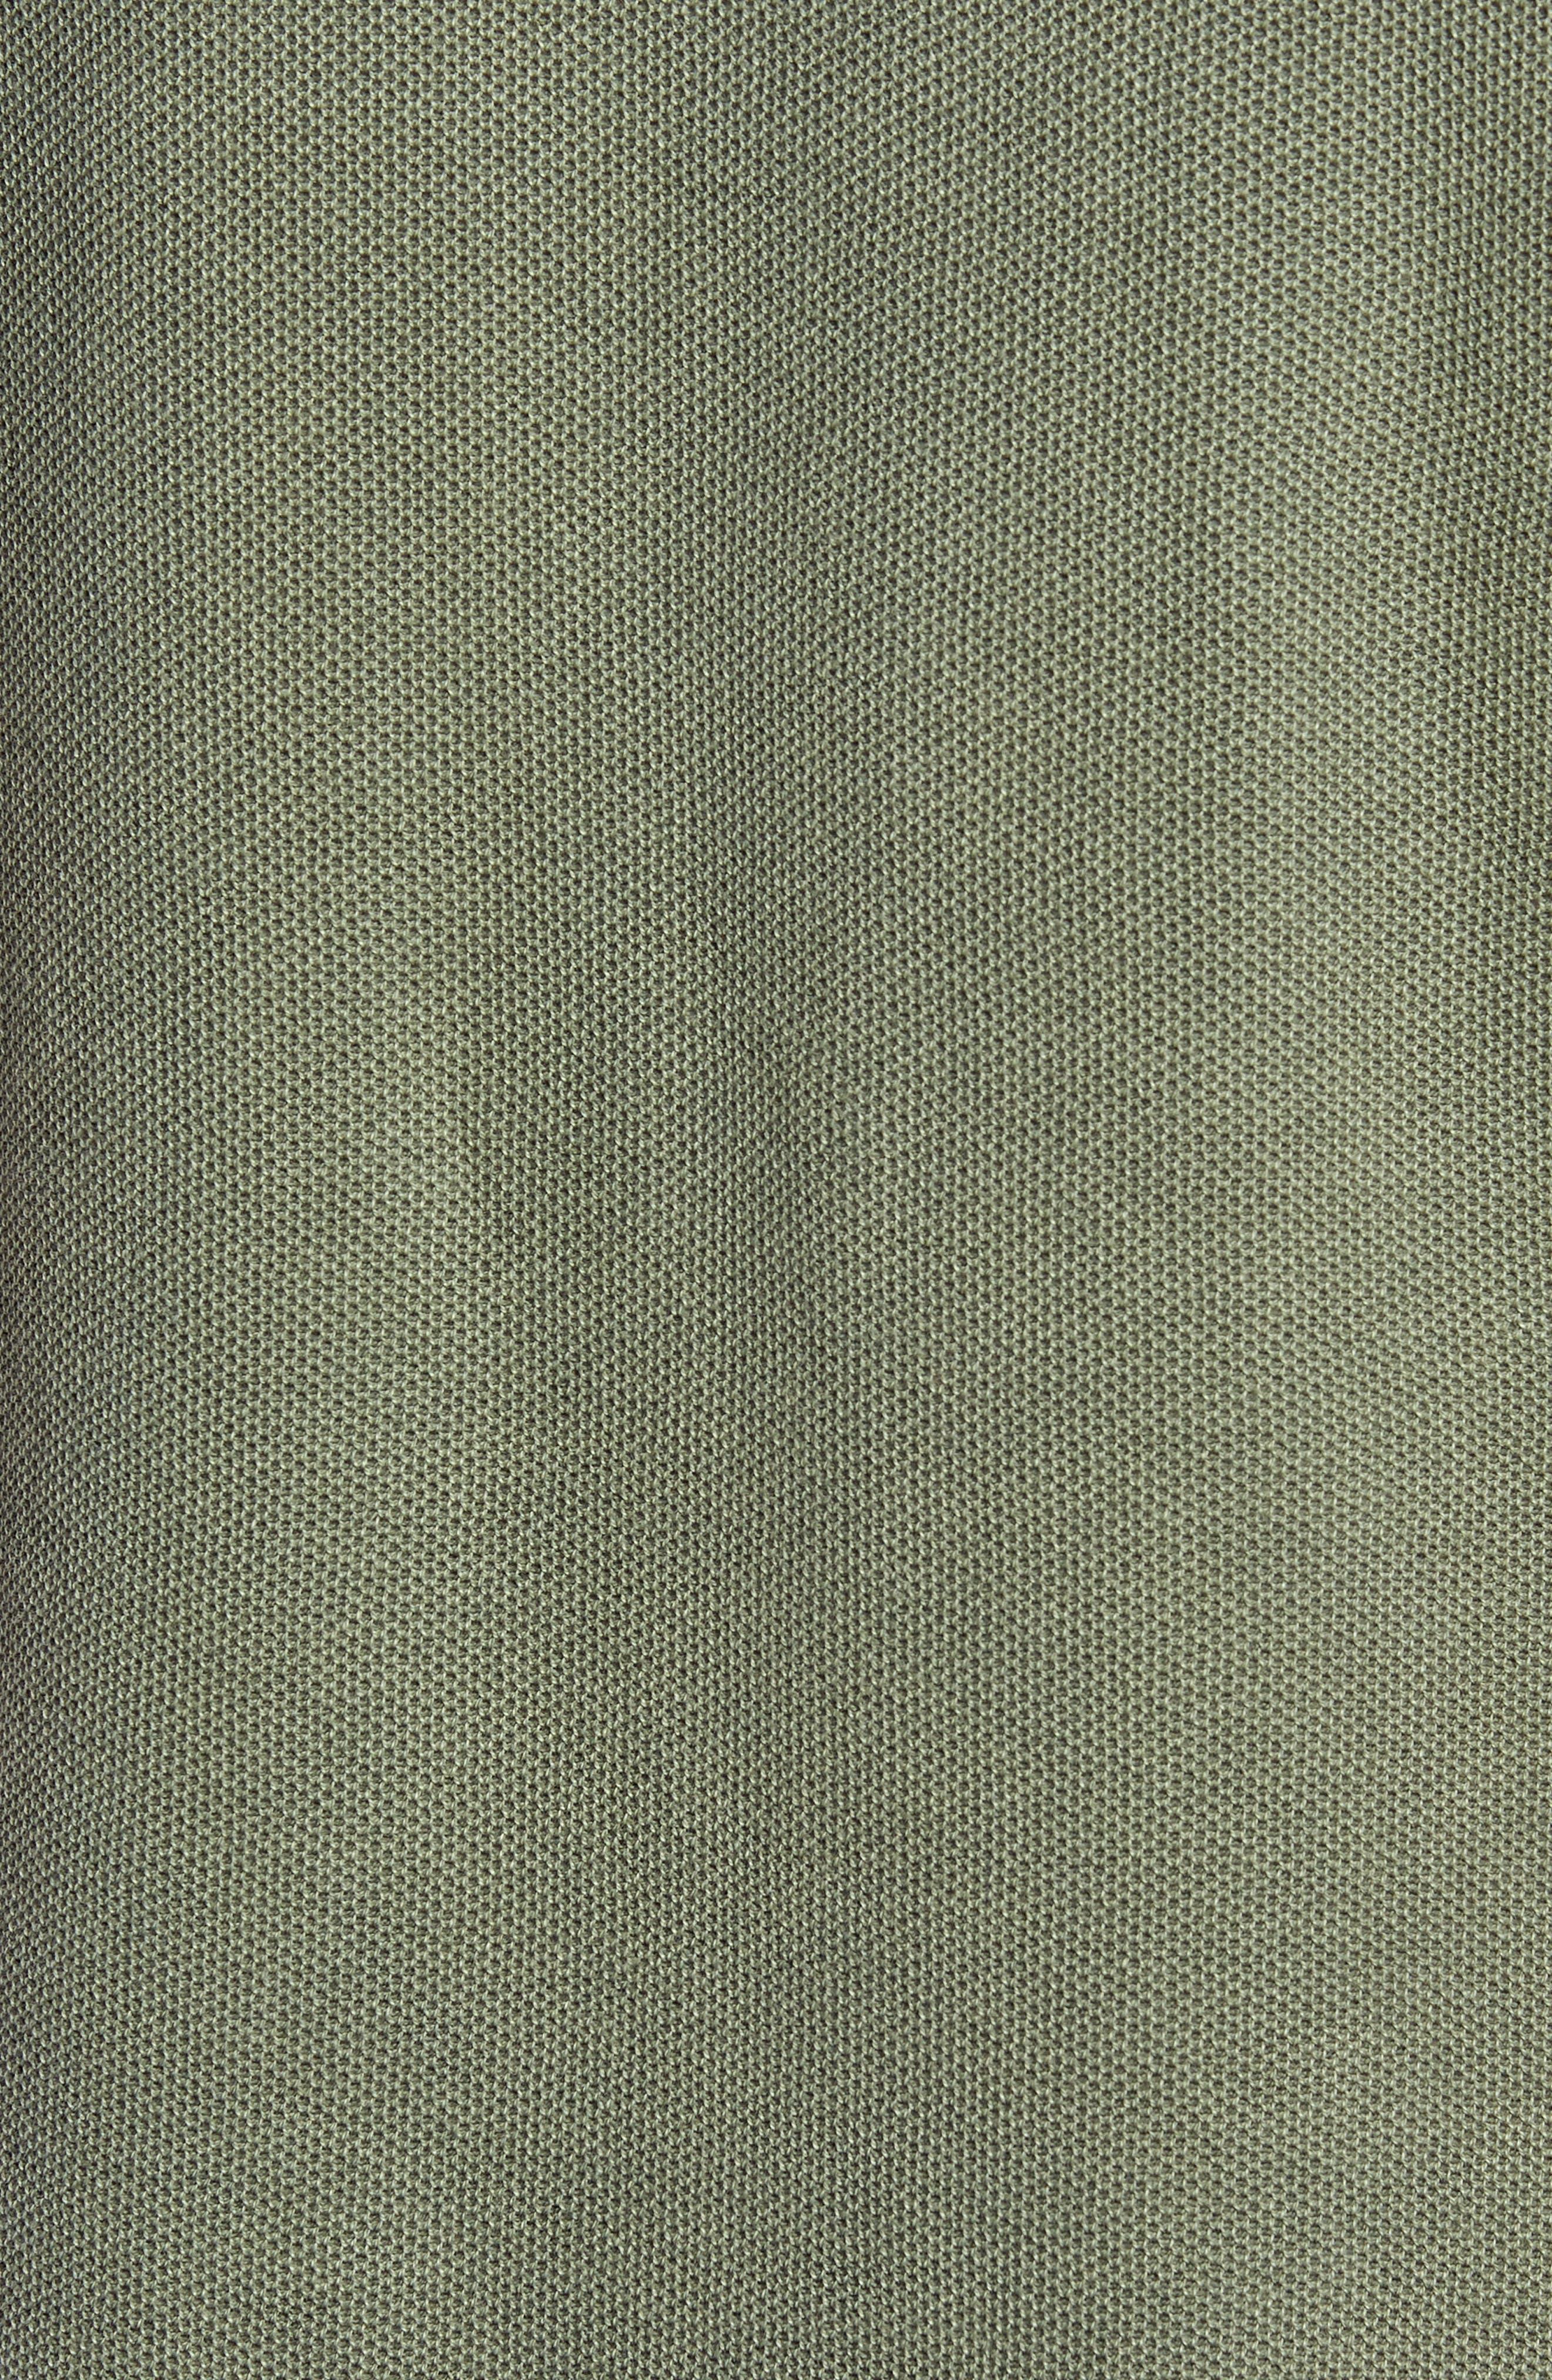 Piqué Polo,                             Alternate thumbnail 5, color,                             Light Olive